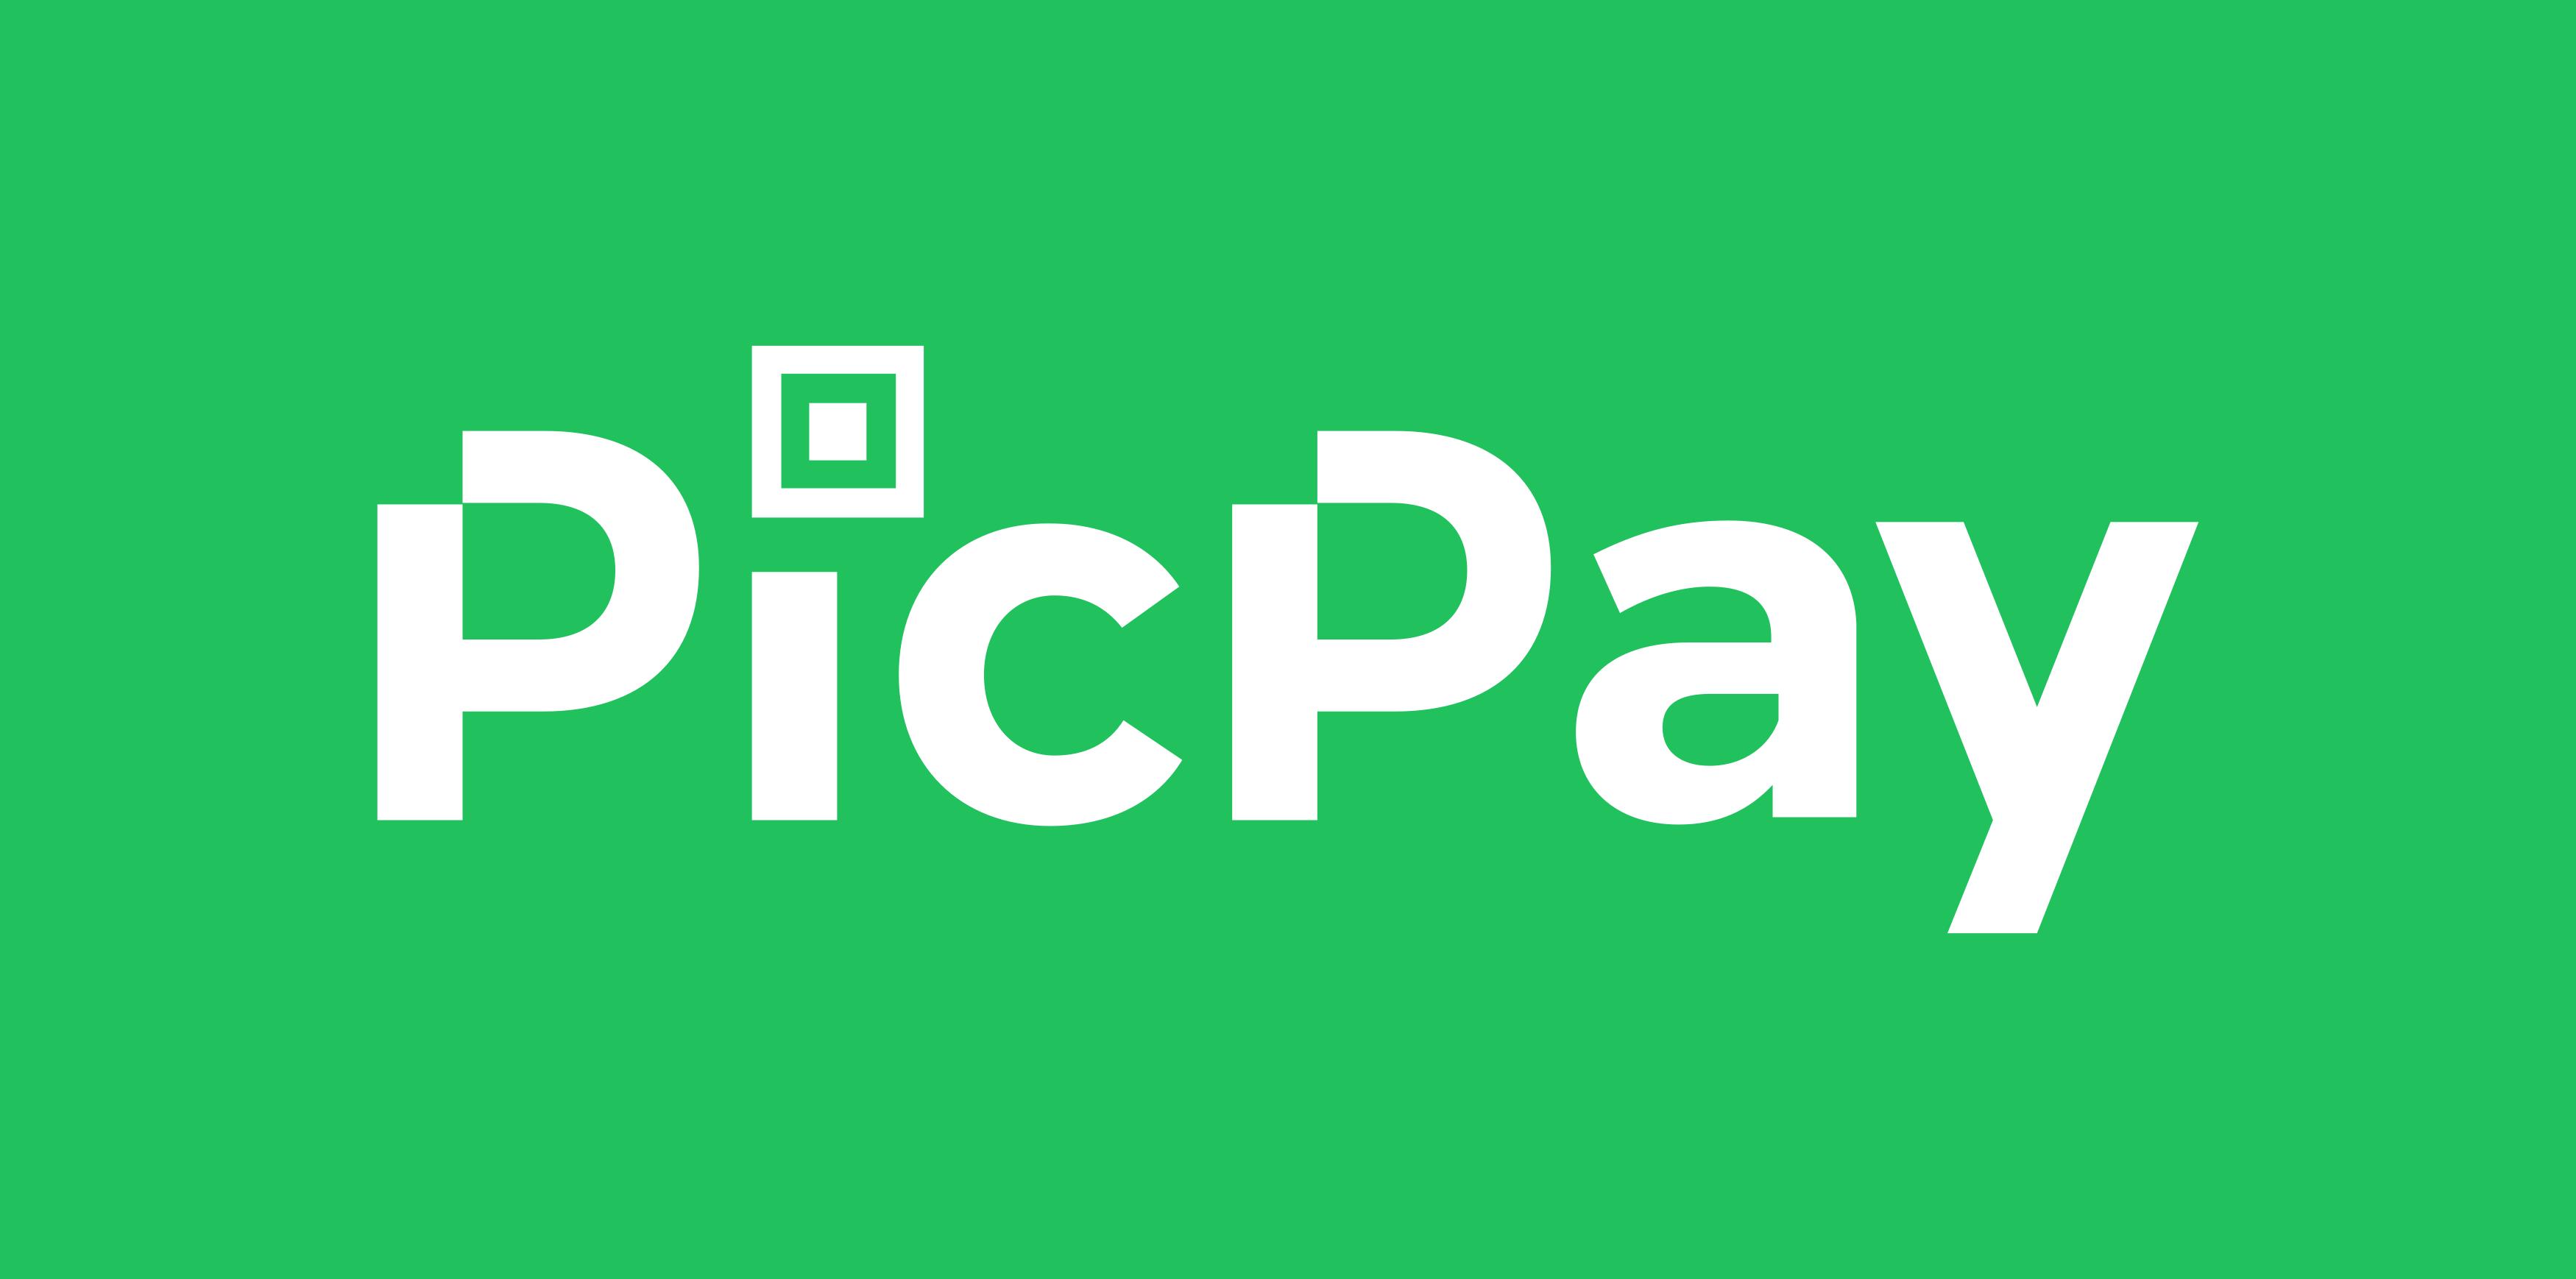 PicPay logo